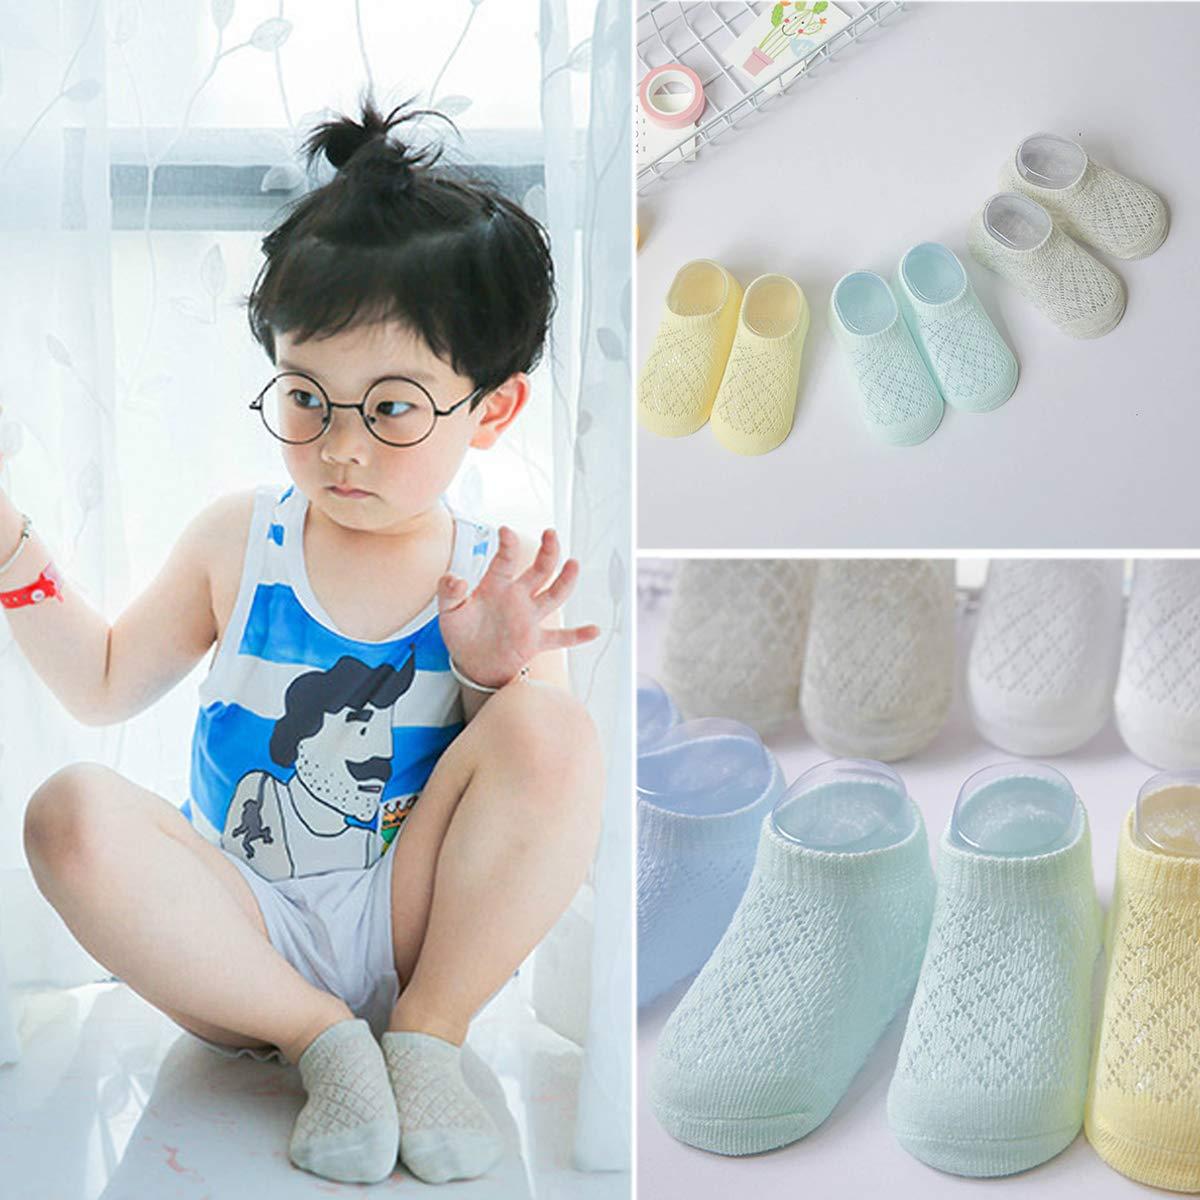 Pack of 5 Mesh Thin Baby Girls Boys Cotton Socks Toddler Infant Kids No Show Ankle Socks Multipack